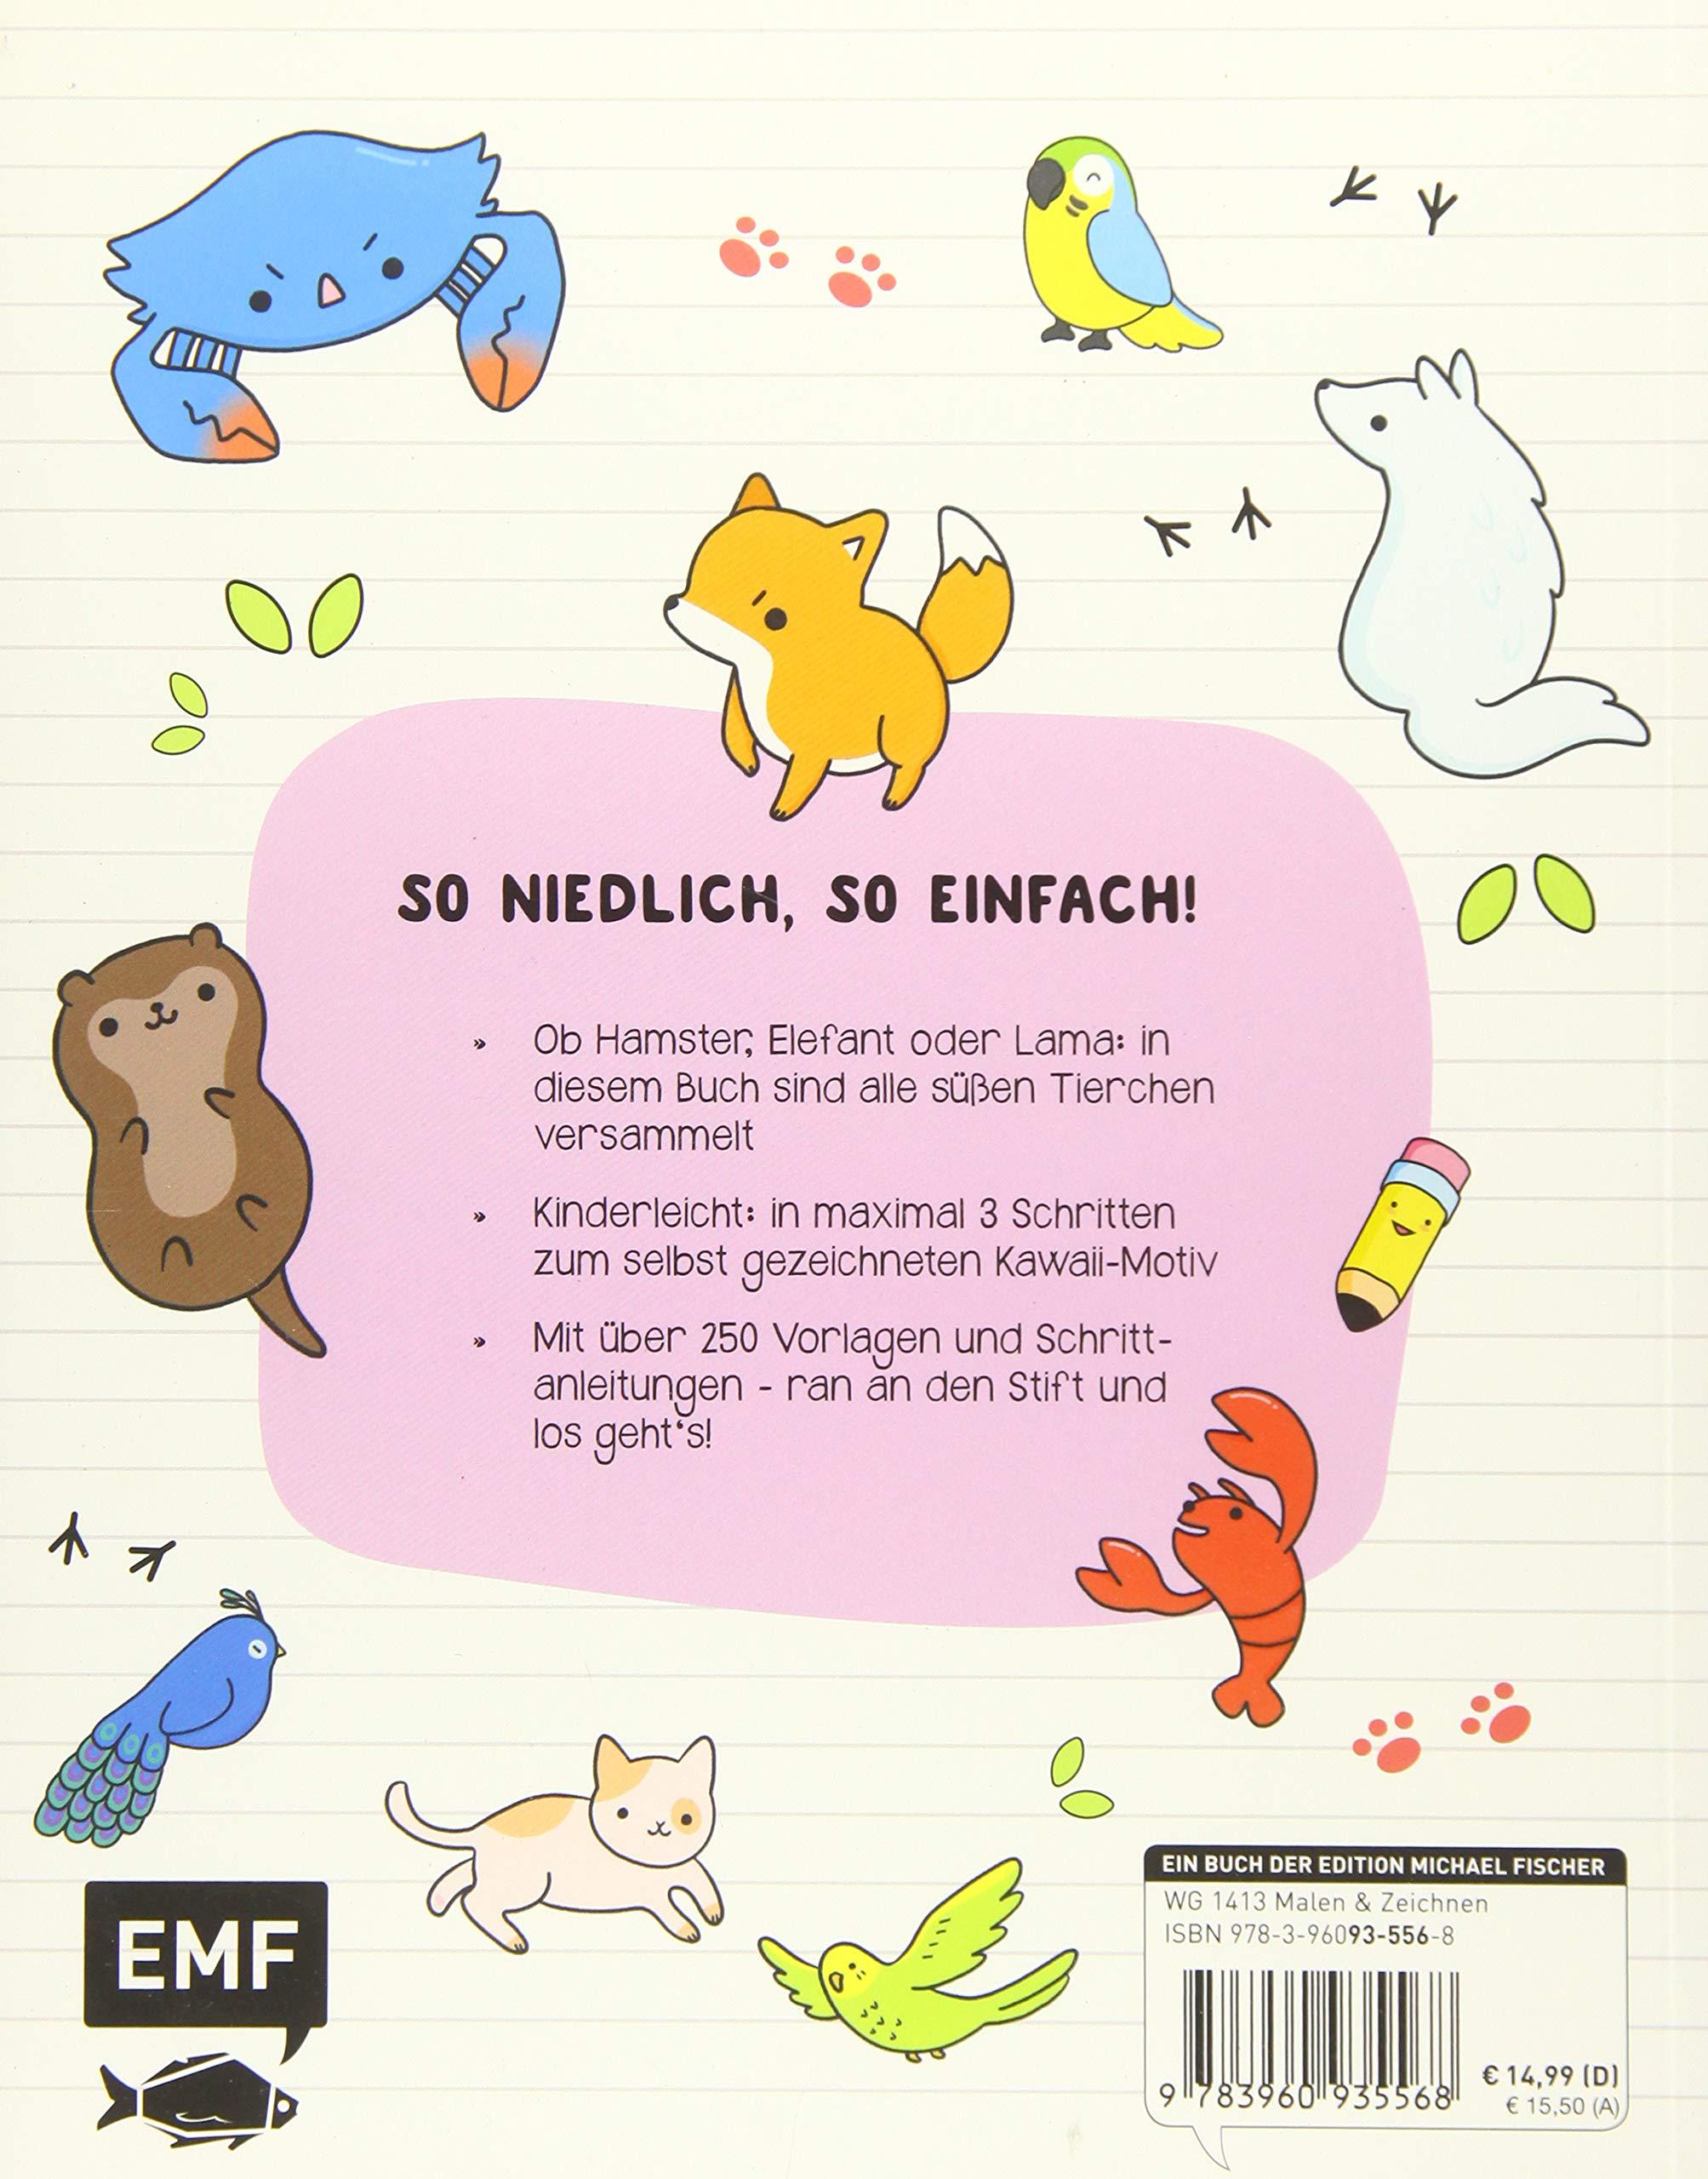 TOPBATHY Frauen Kochen Sch/ürze Niedlichen Cartoon Kawaii Katze Sch/ürze Lustige K/üche L/ätzchen K/üchenchef K/üche Sch/ürze Kochen Backen Grill Sch/ürze